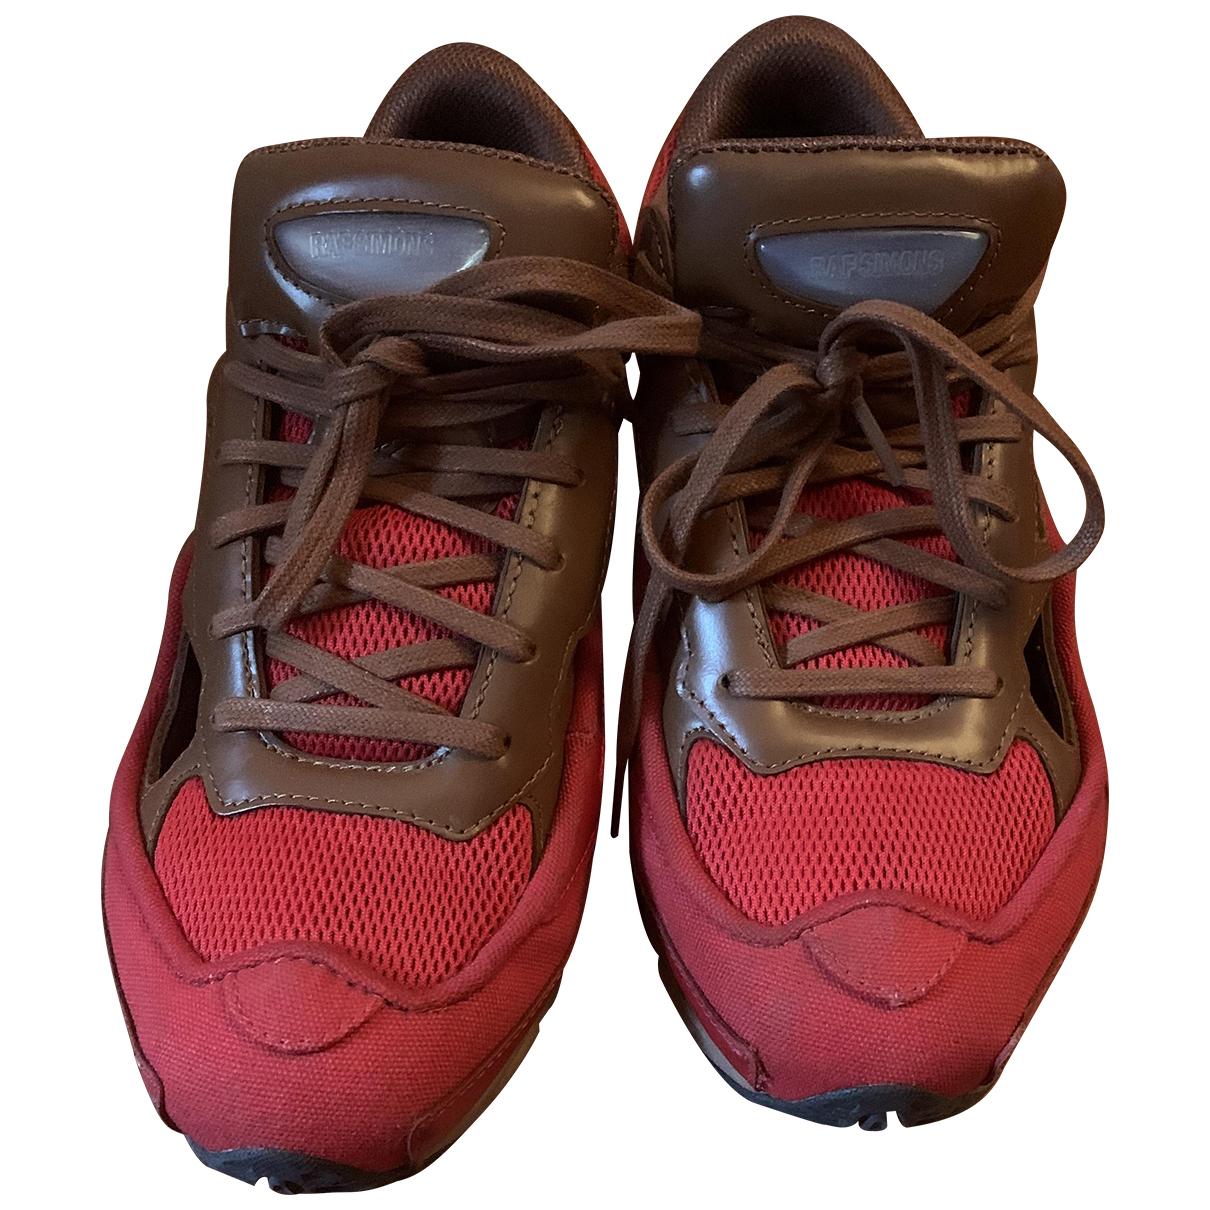 Adidas X Raf Simons Replicant Owzeego Sneakers in  Rot Leder